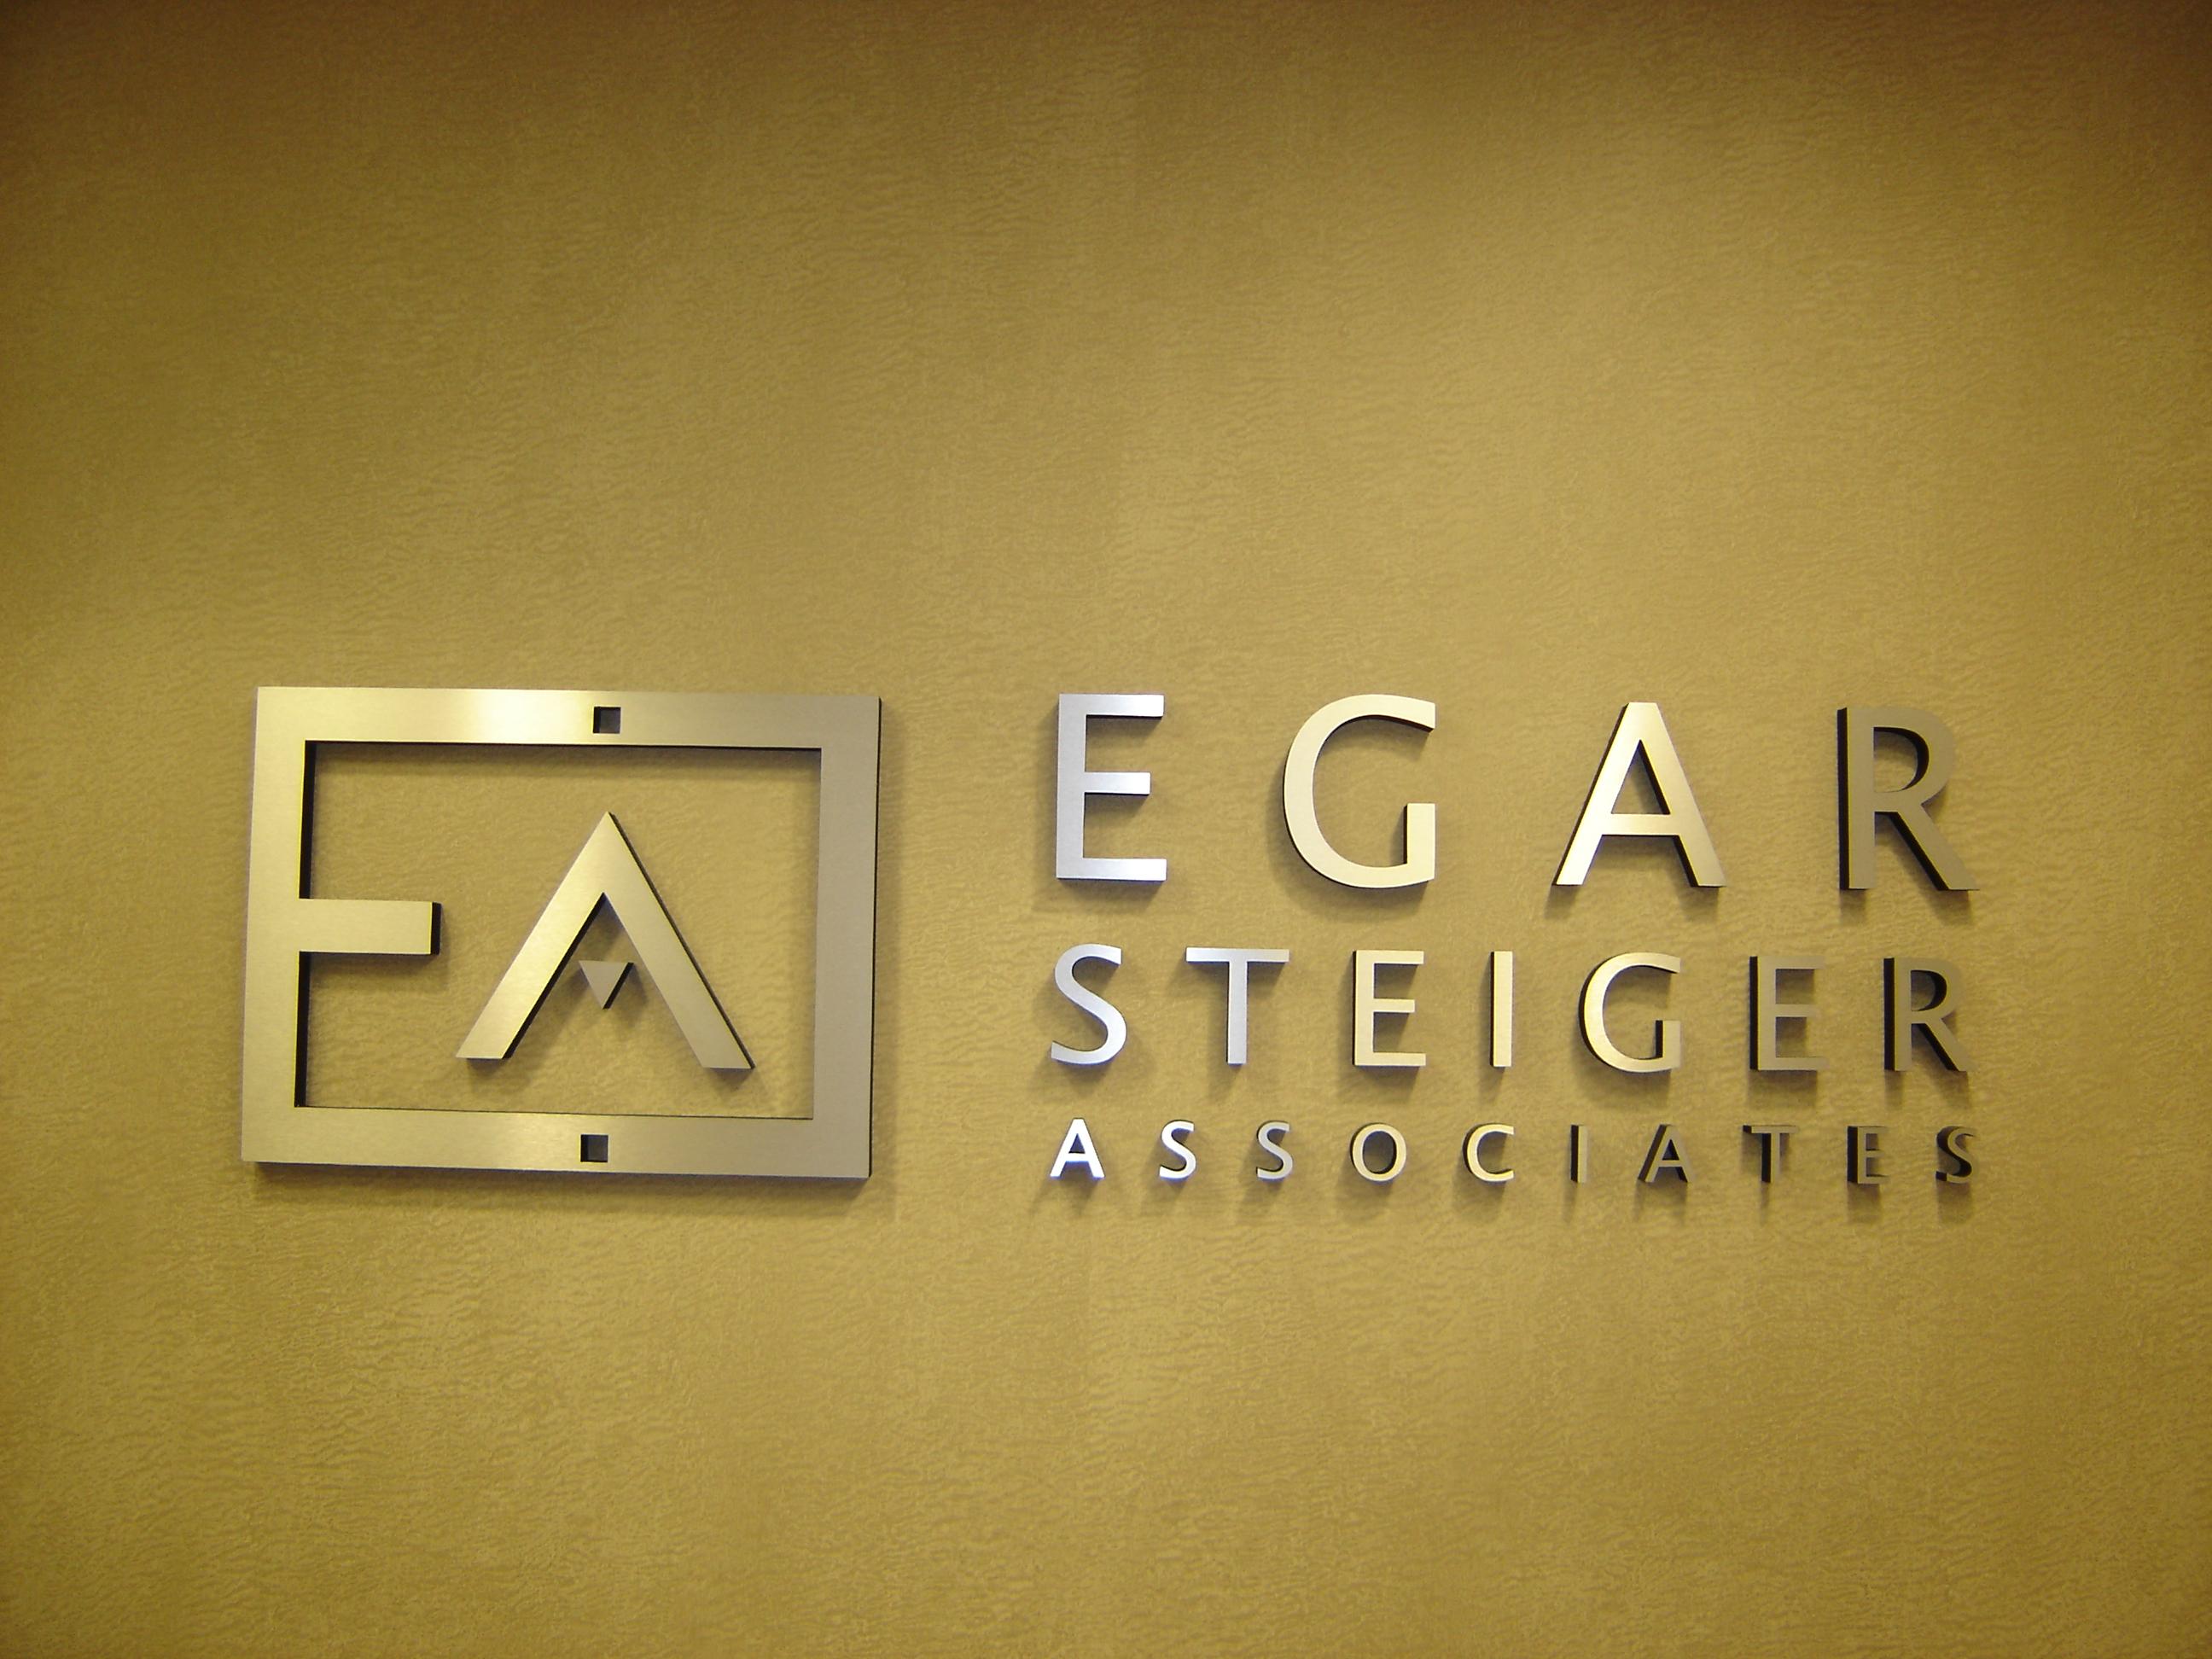 Egar Steiger